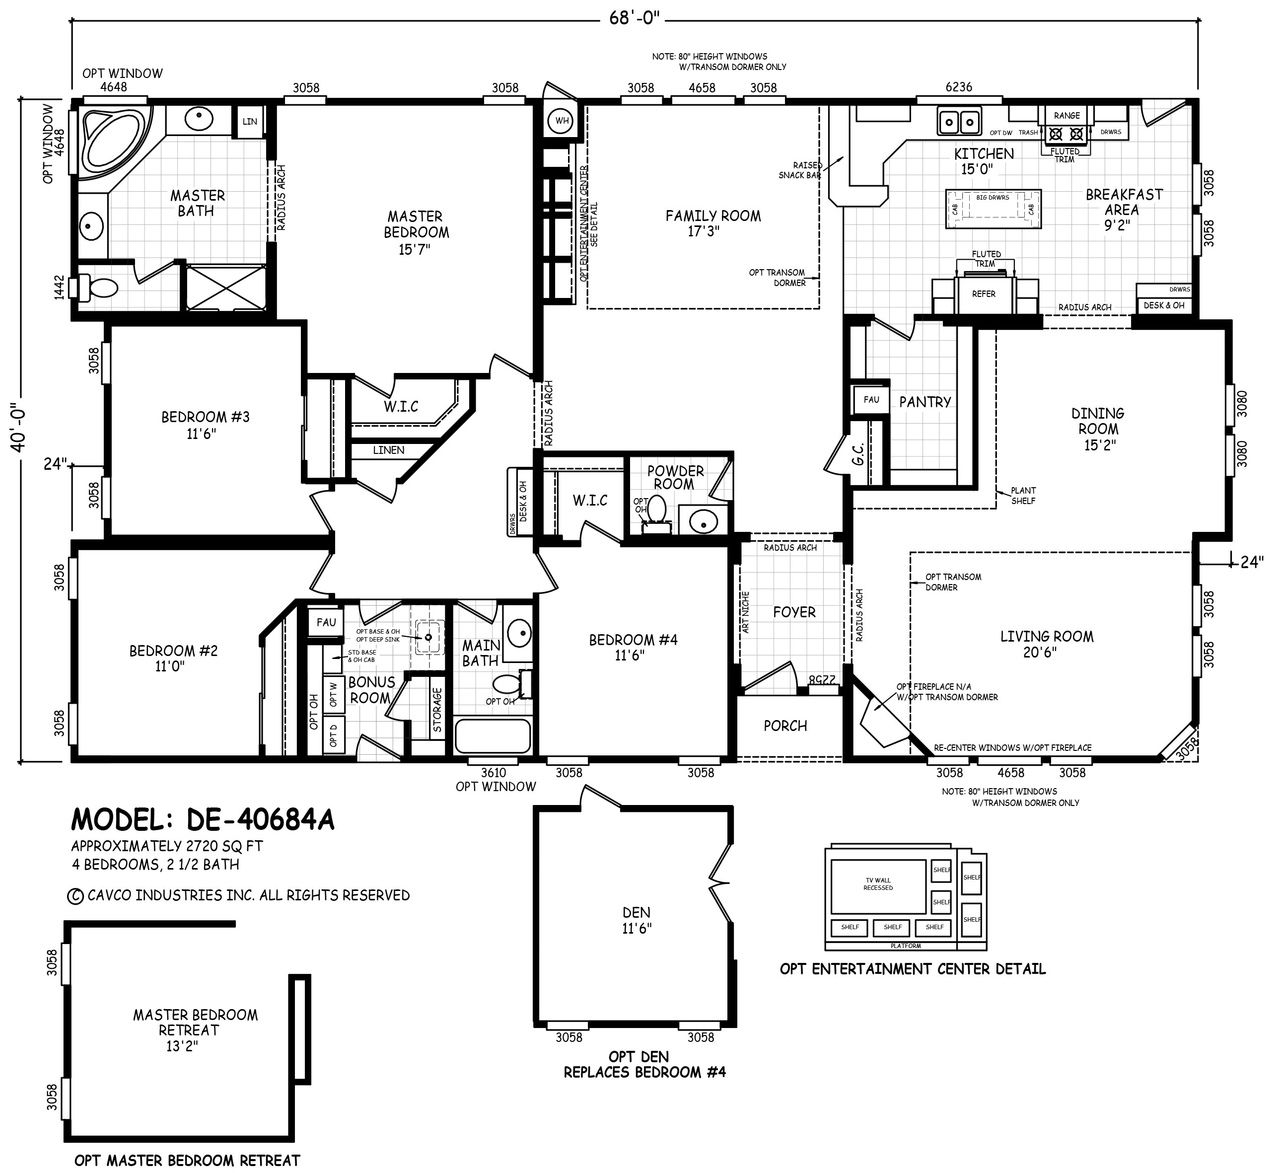 Floor Plan De 40684a Desert Edge Homes By Cavco West Cavco Manufactured Home Floor Pl Manufactured Homes Floor Plans Ranch Home Floor Plans Floor Plans